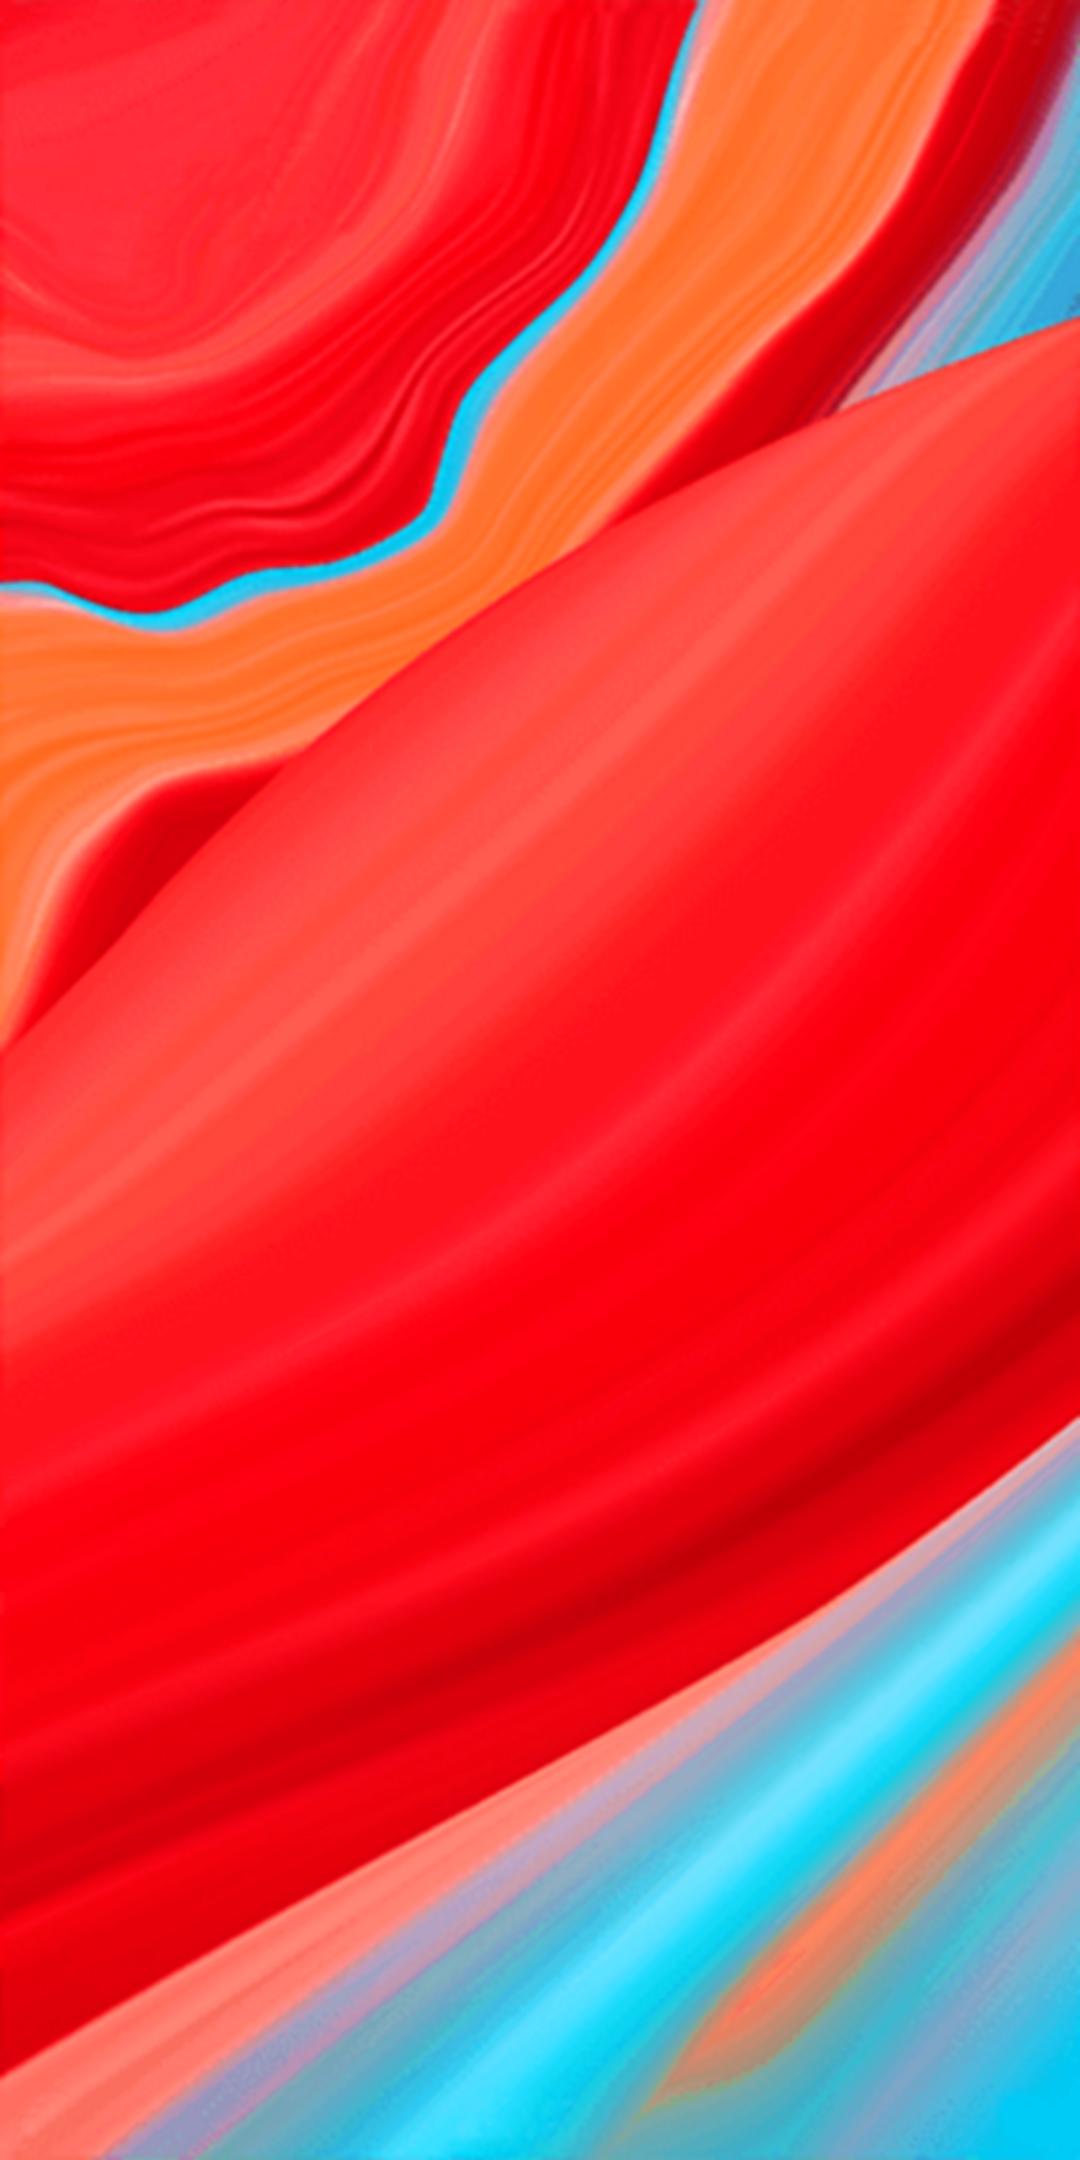 download xiaomi redmi s2 stock wallpapers | droidviews